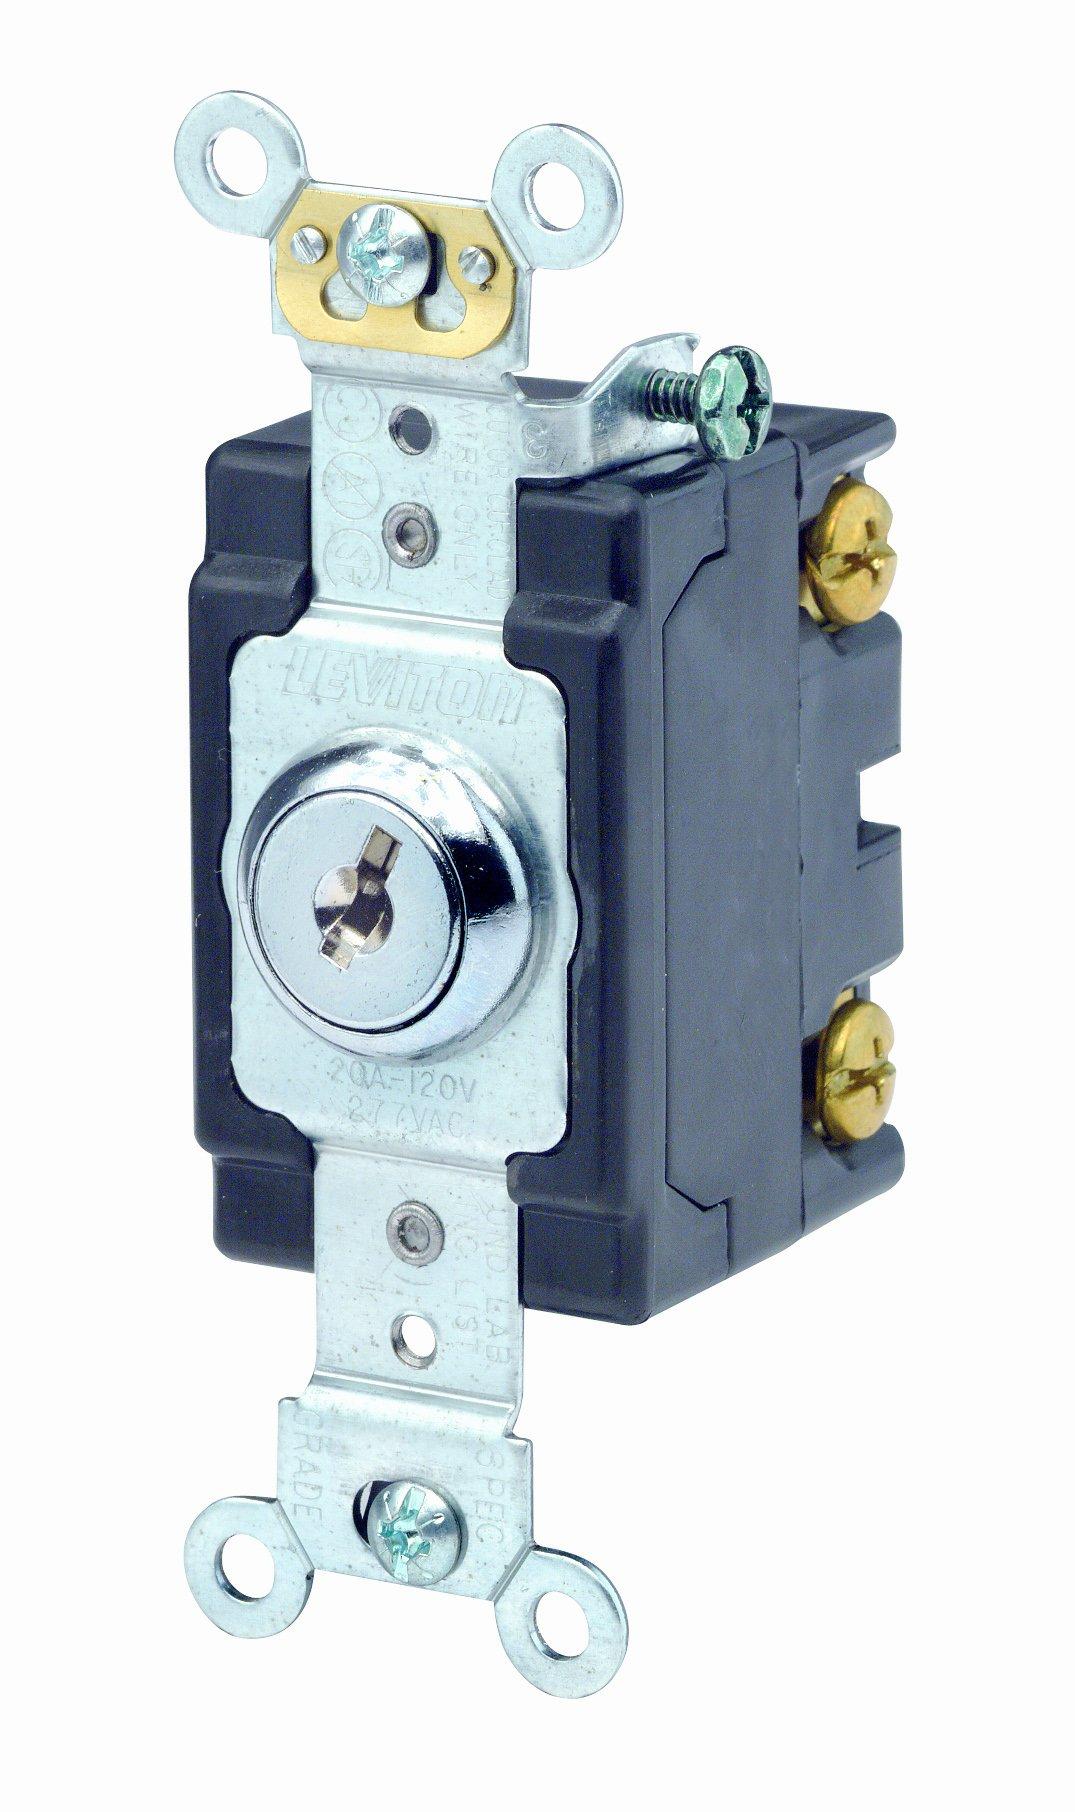 Leviton 1221-2KL 20 Amp, 120/277 Volt, Key Locking, Single-Pole, AC Quiet Switch, Extra Heavy Duty Spec Grade, Self Grounding, Chrome